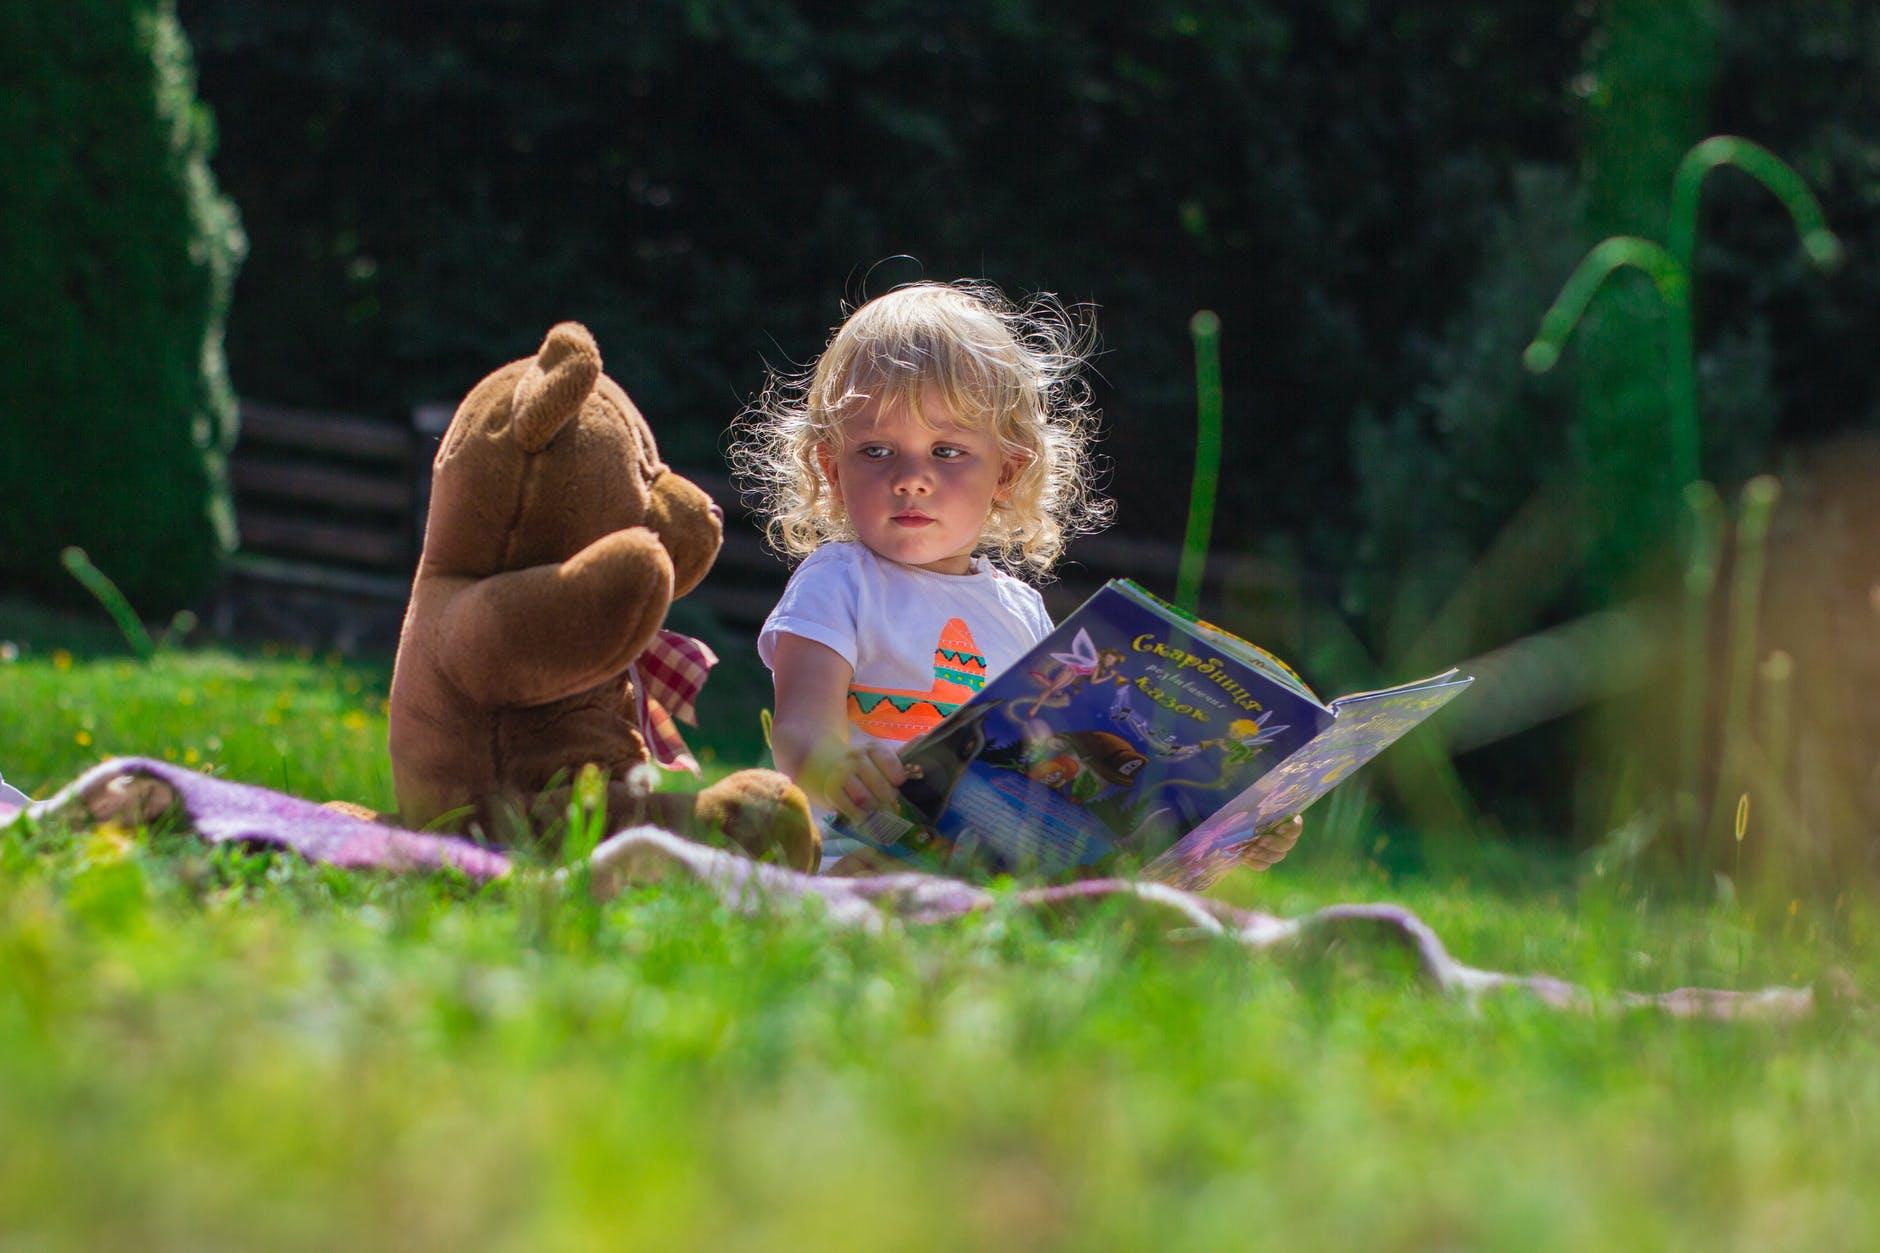 girl sitting beside a teddy bear